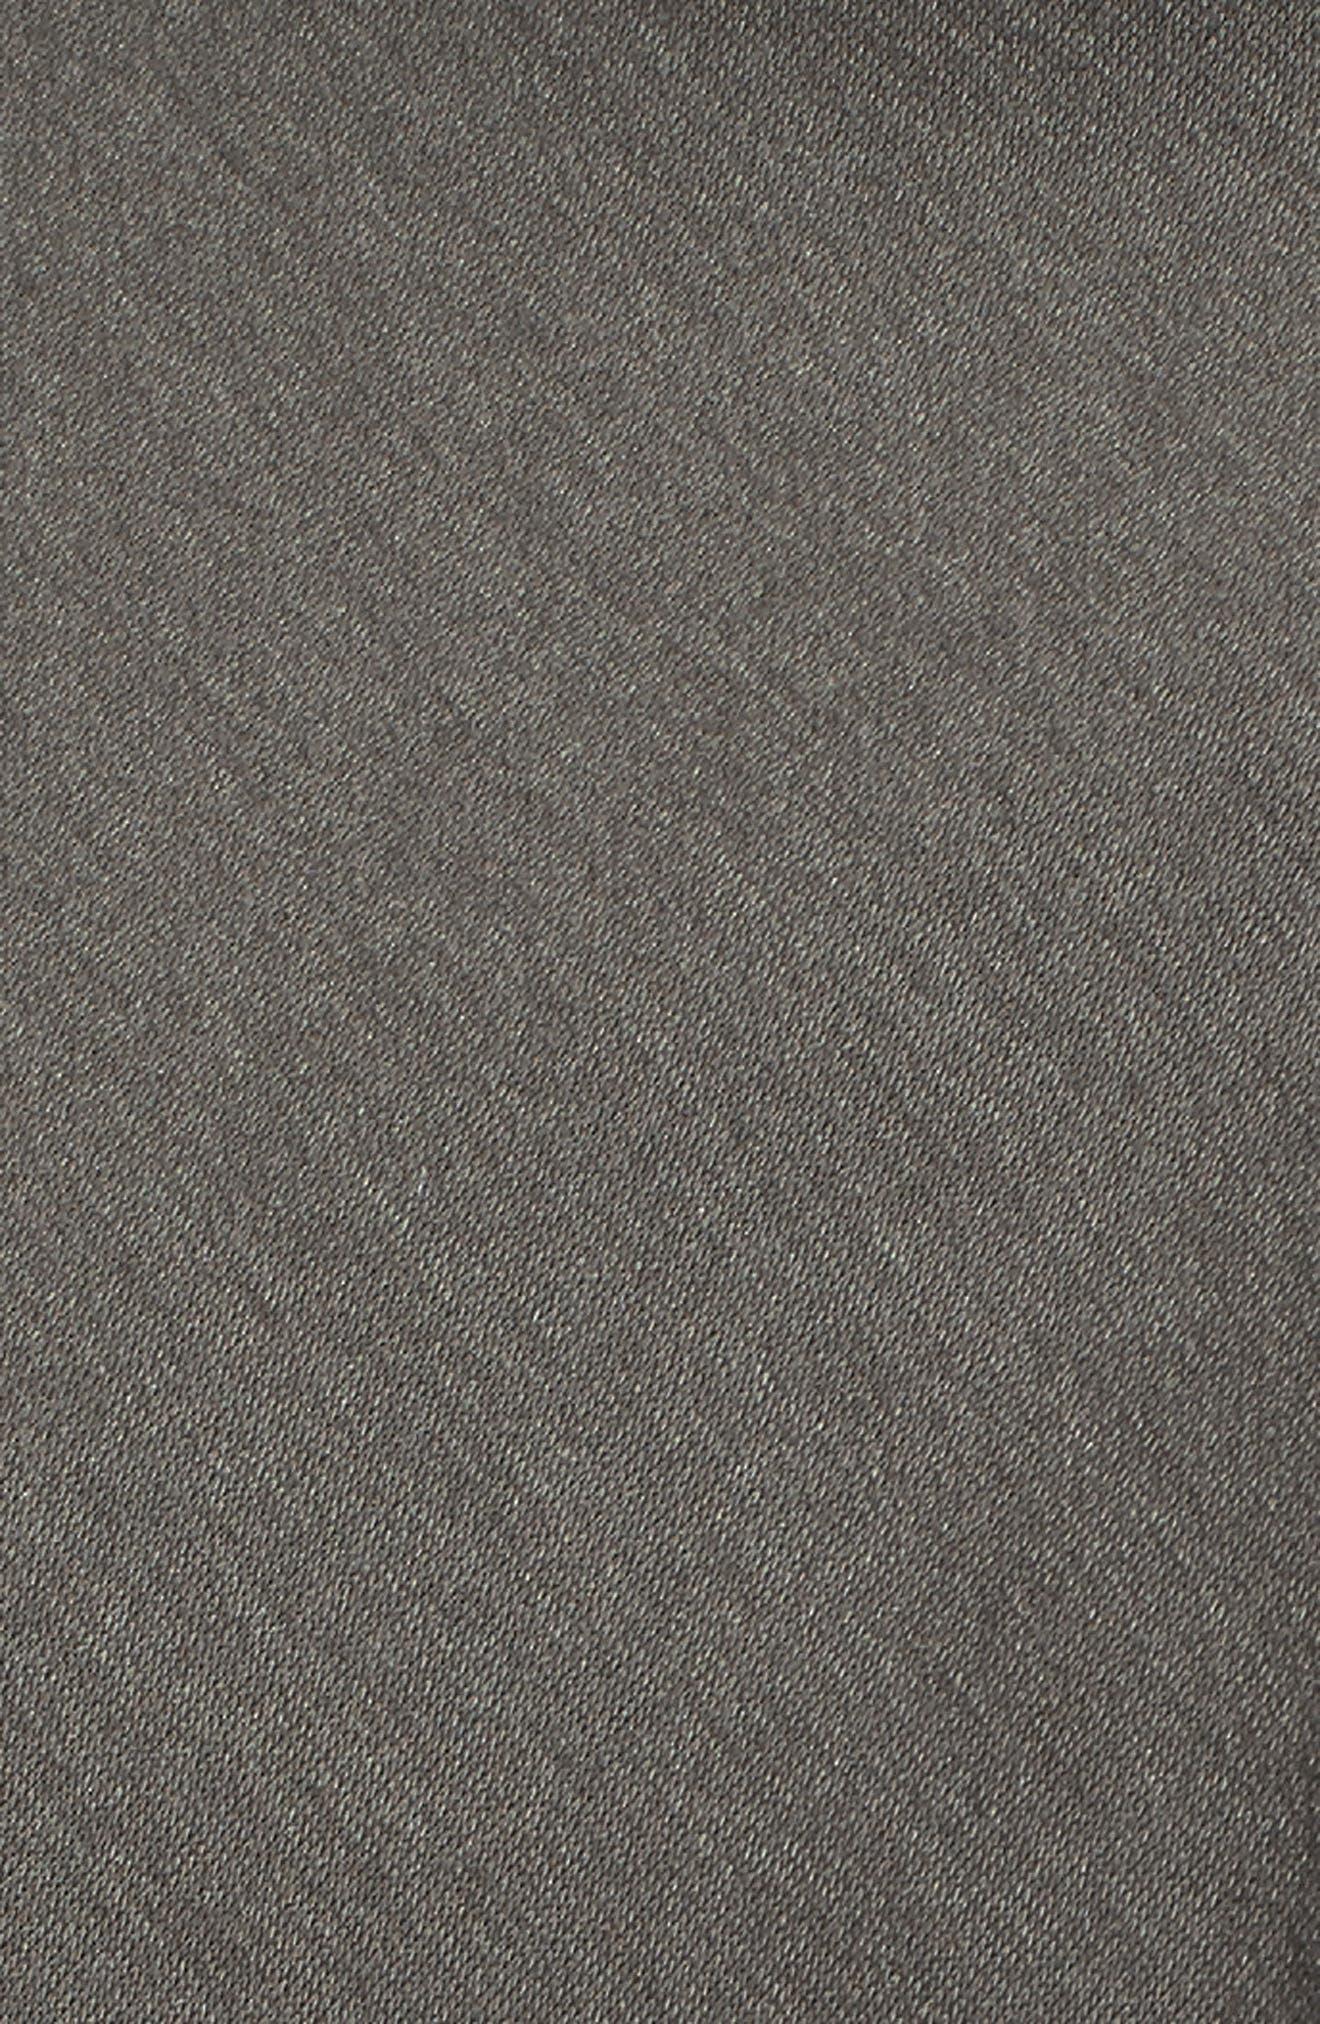 ,                             One-Button Fleece Wrap Cardigan,                             Alternate thumbnail 87, color,                             333